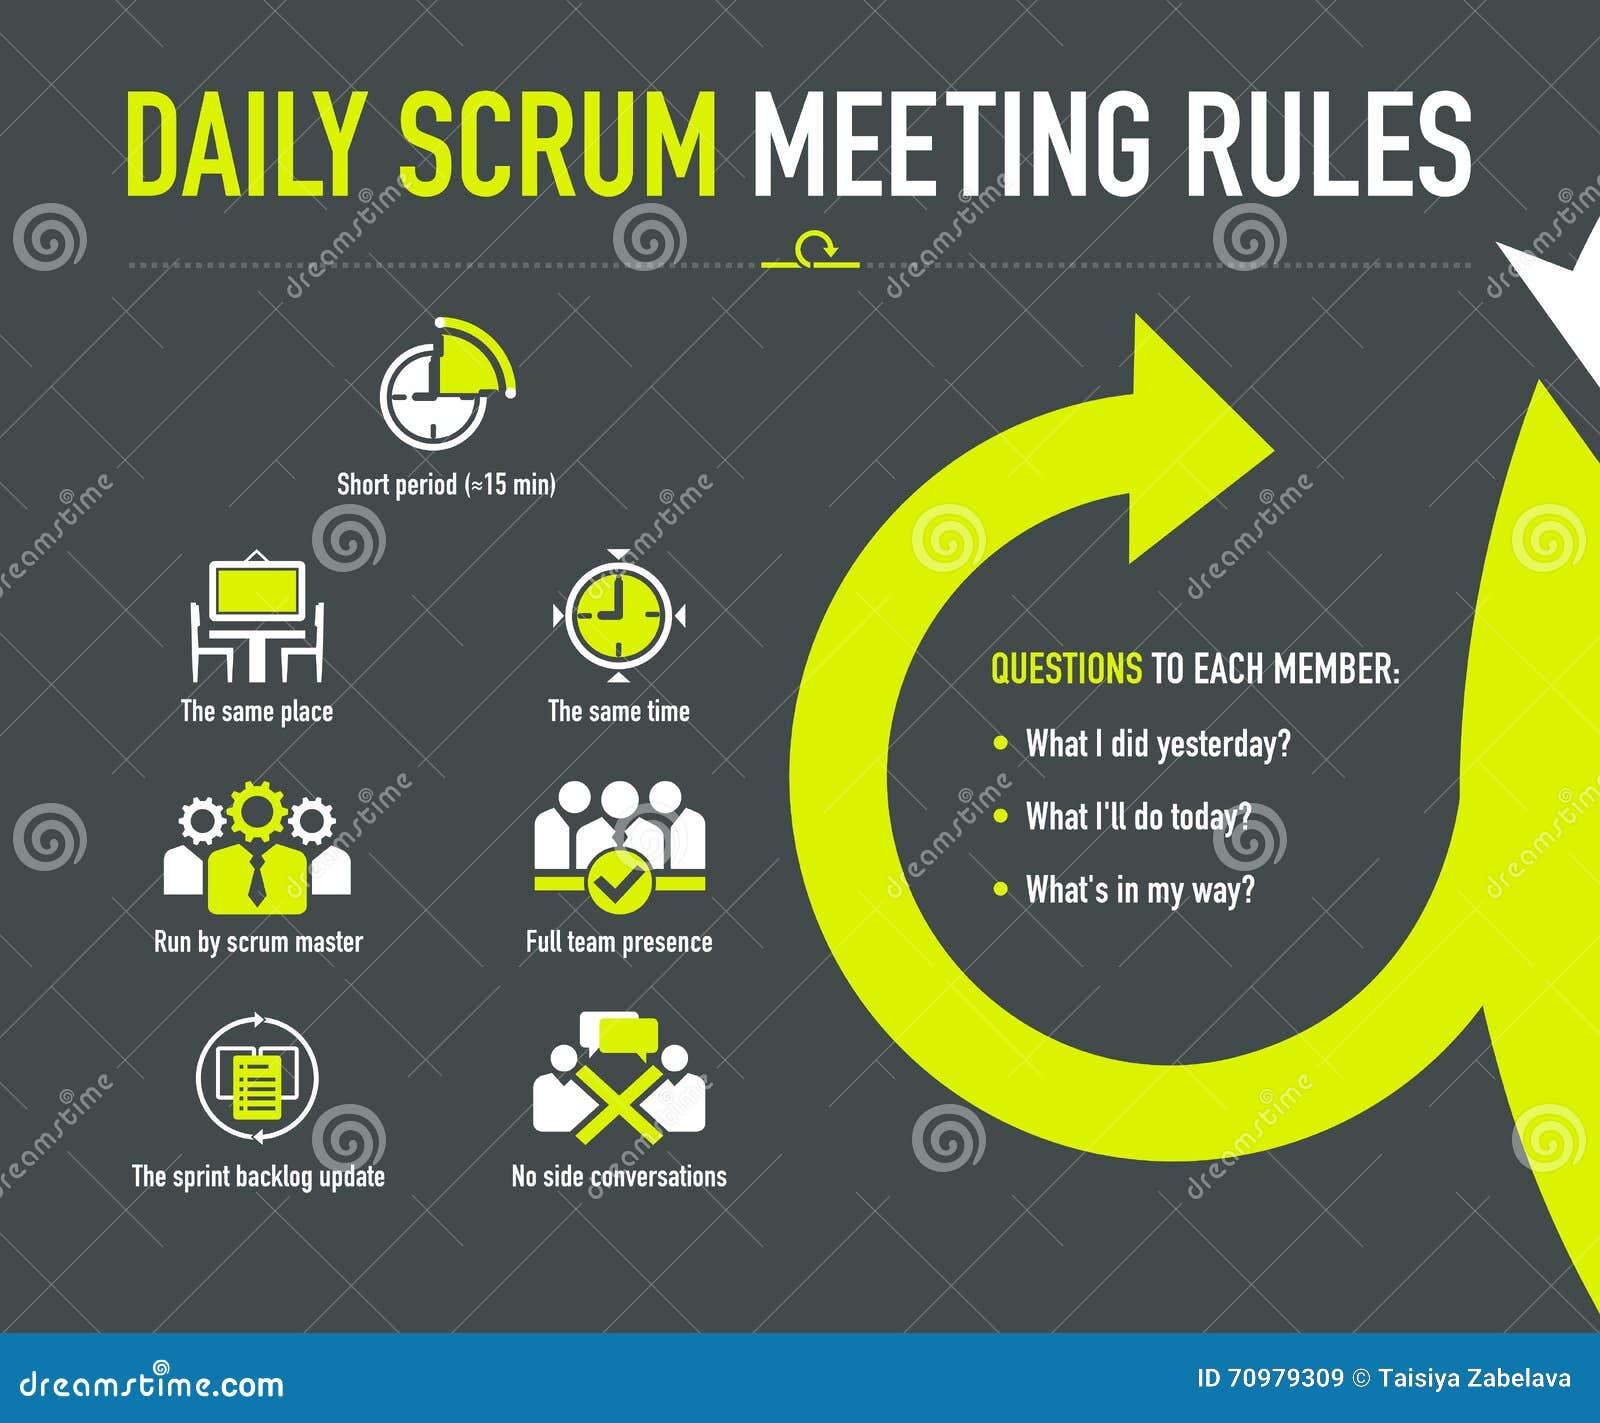 Daily Scrum Meeting Rules Cartoon Vector Cartoondealer